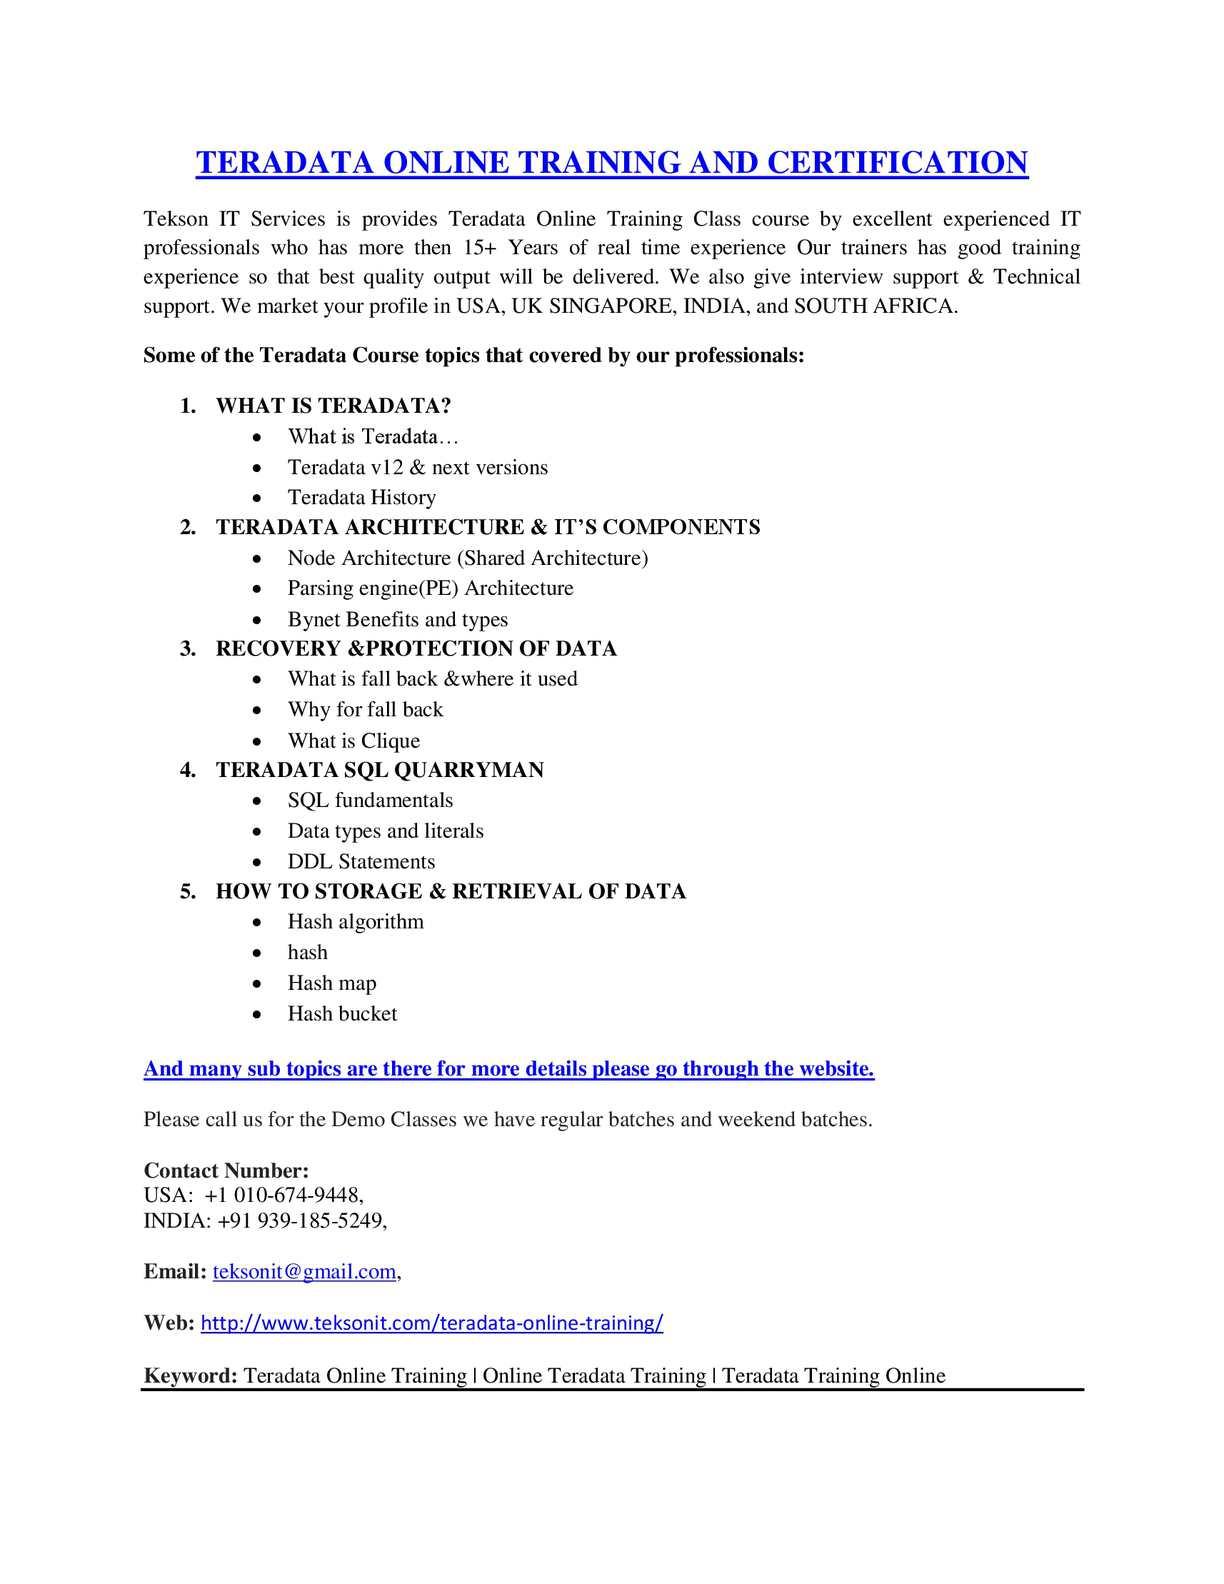 Calamo Teradata Online Training Online Teradata Training